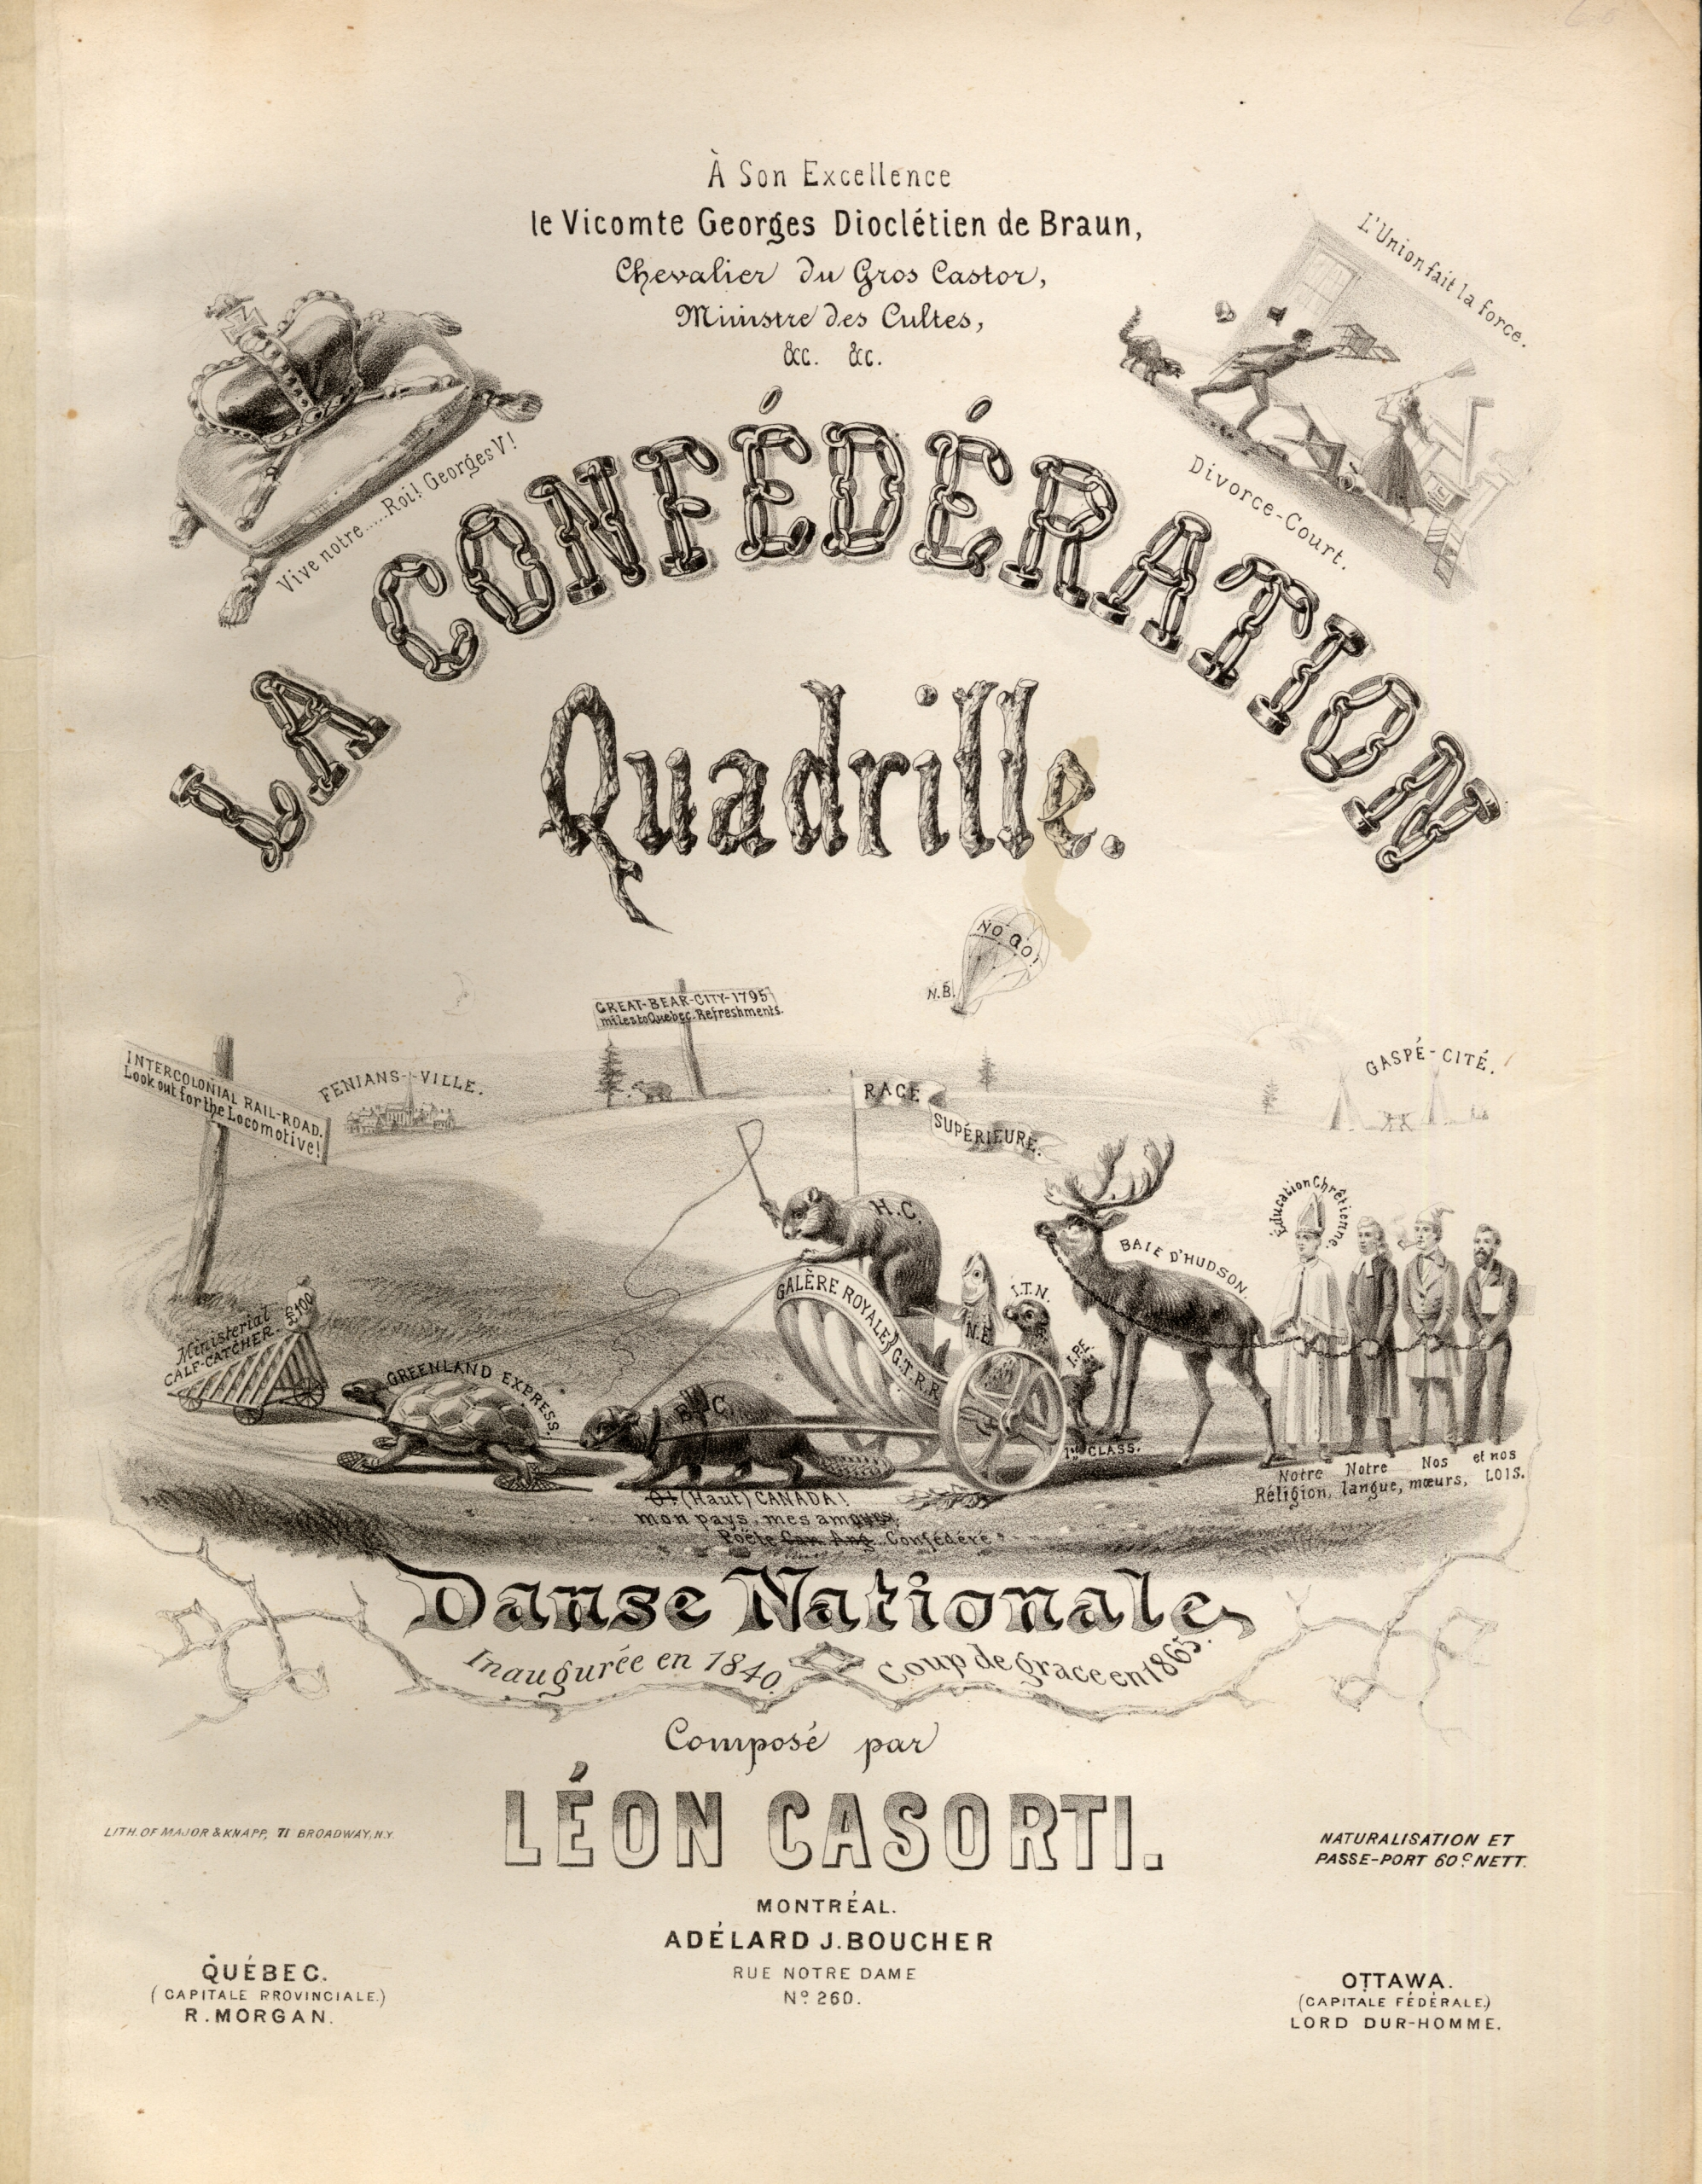 Illustrated cover of sheet music titled La Confédération Quadrille